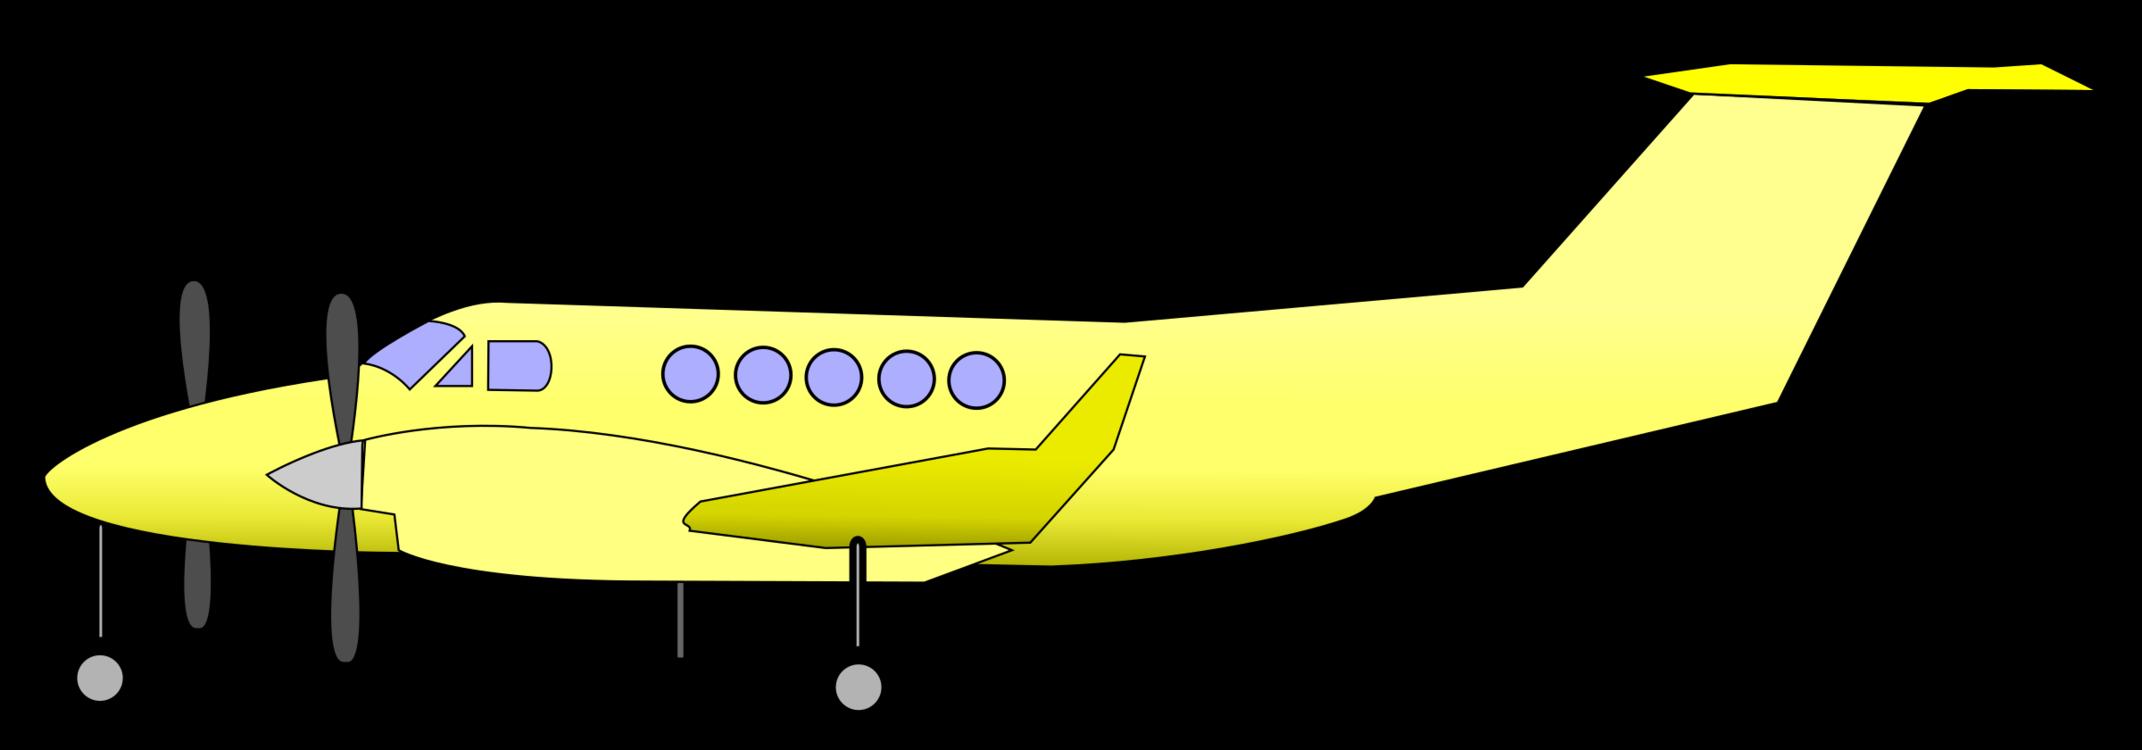 Line,Toy Airplane,Flight